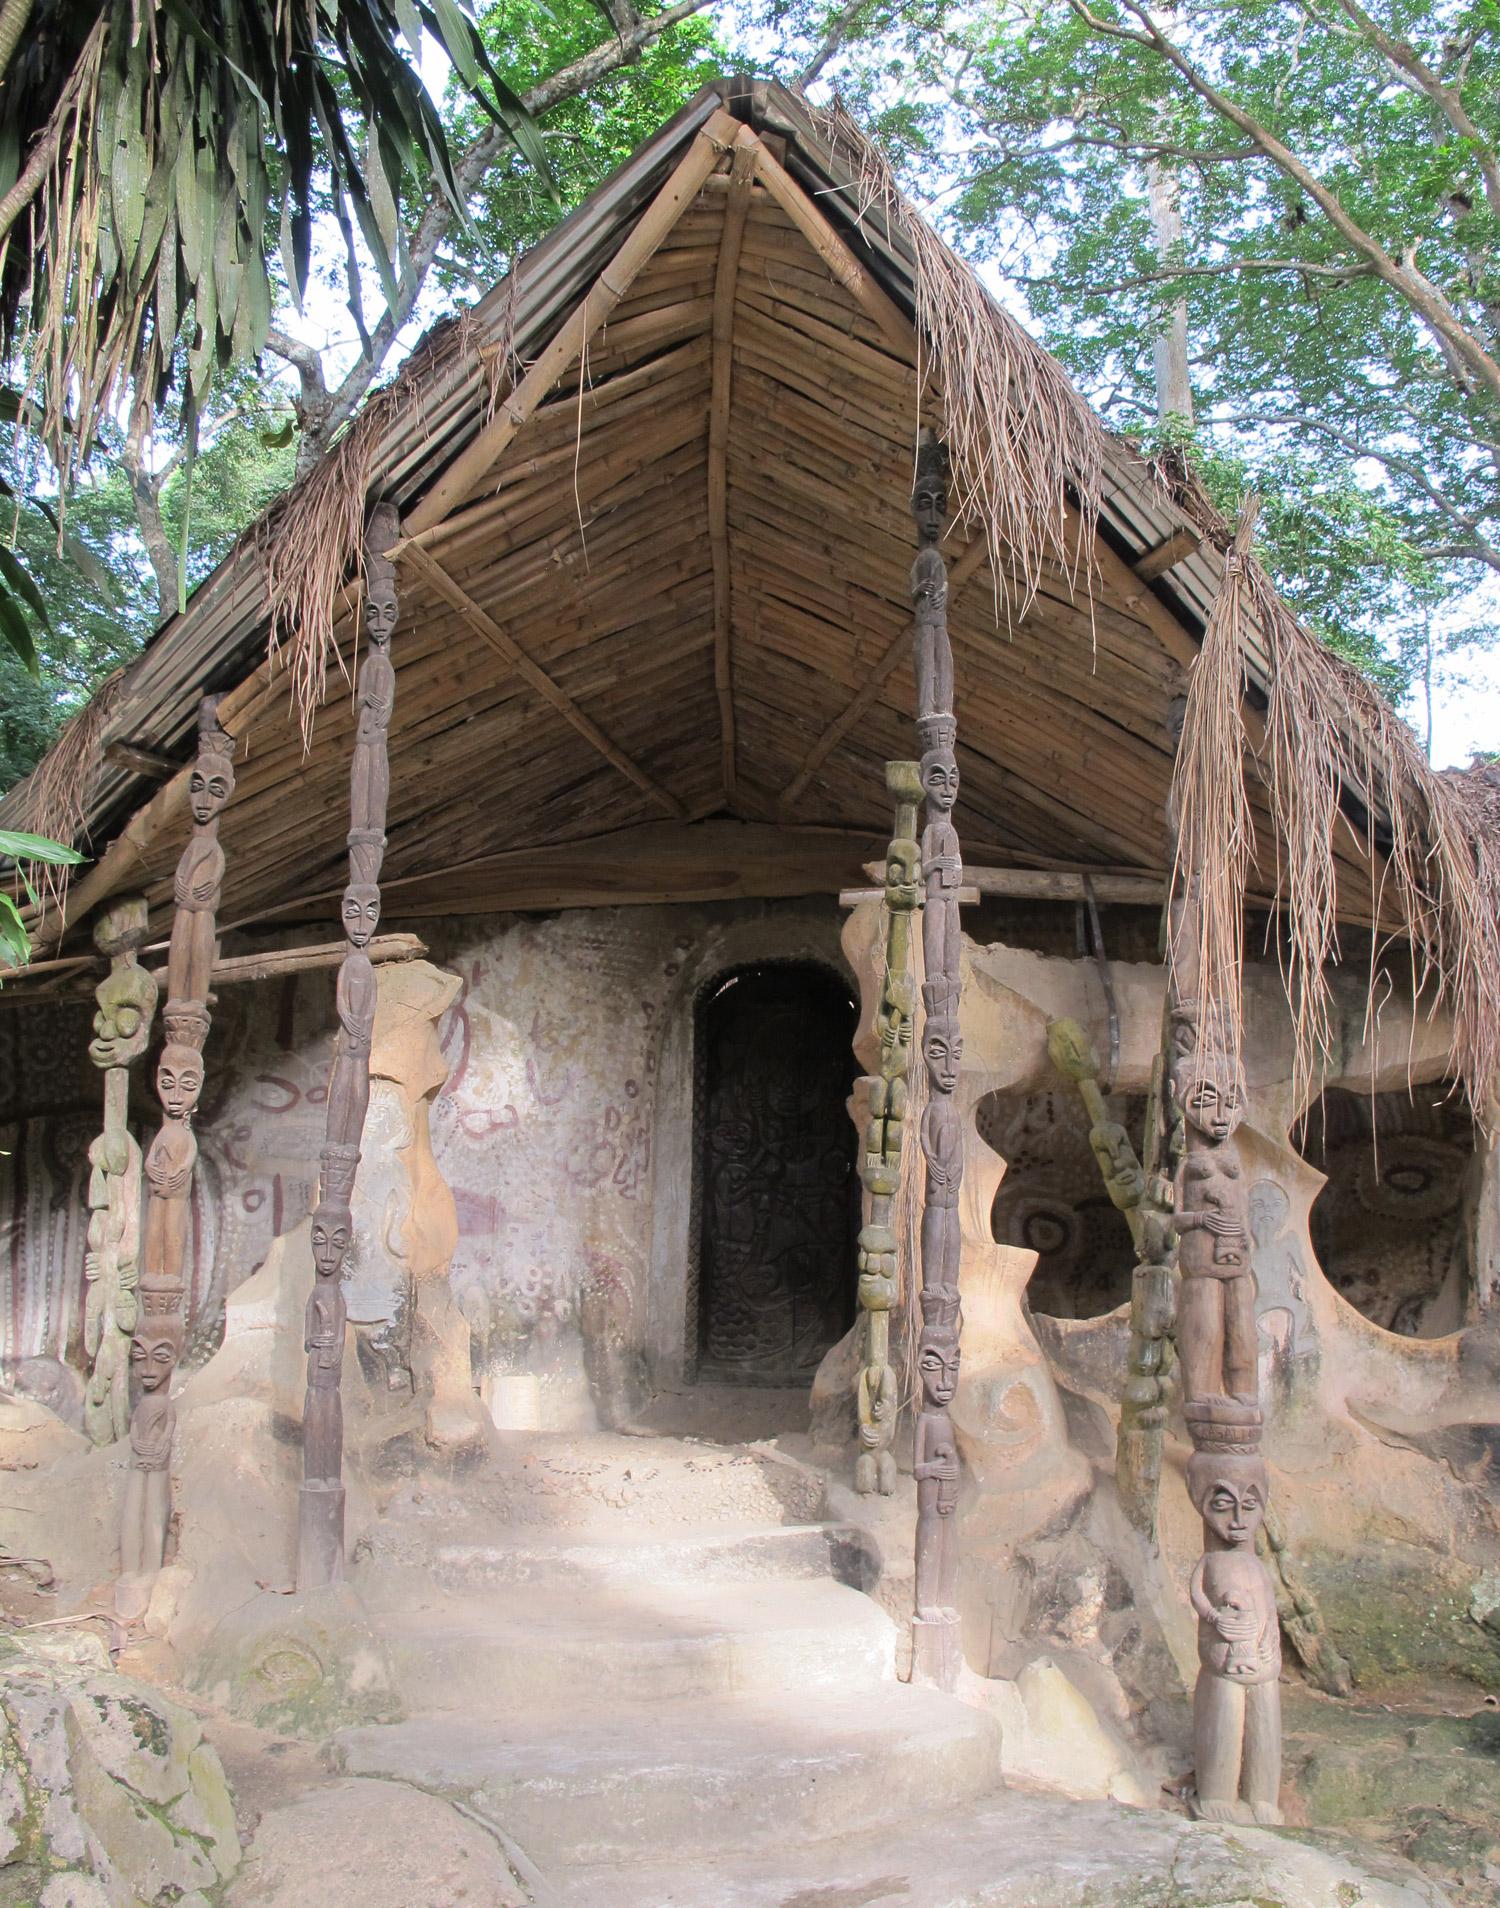 ojubo osun, susanne wenger, sacred grove of osogbo